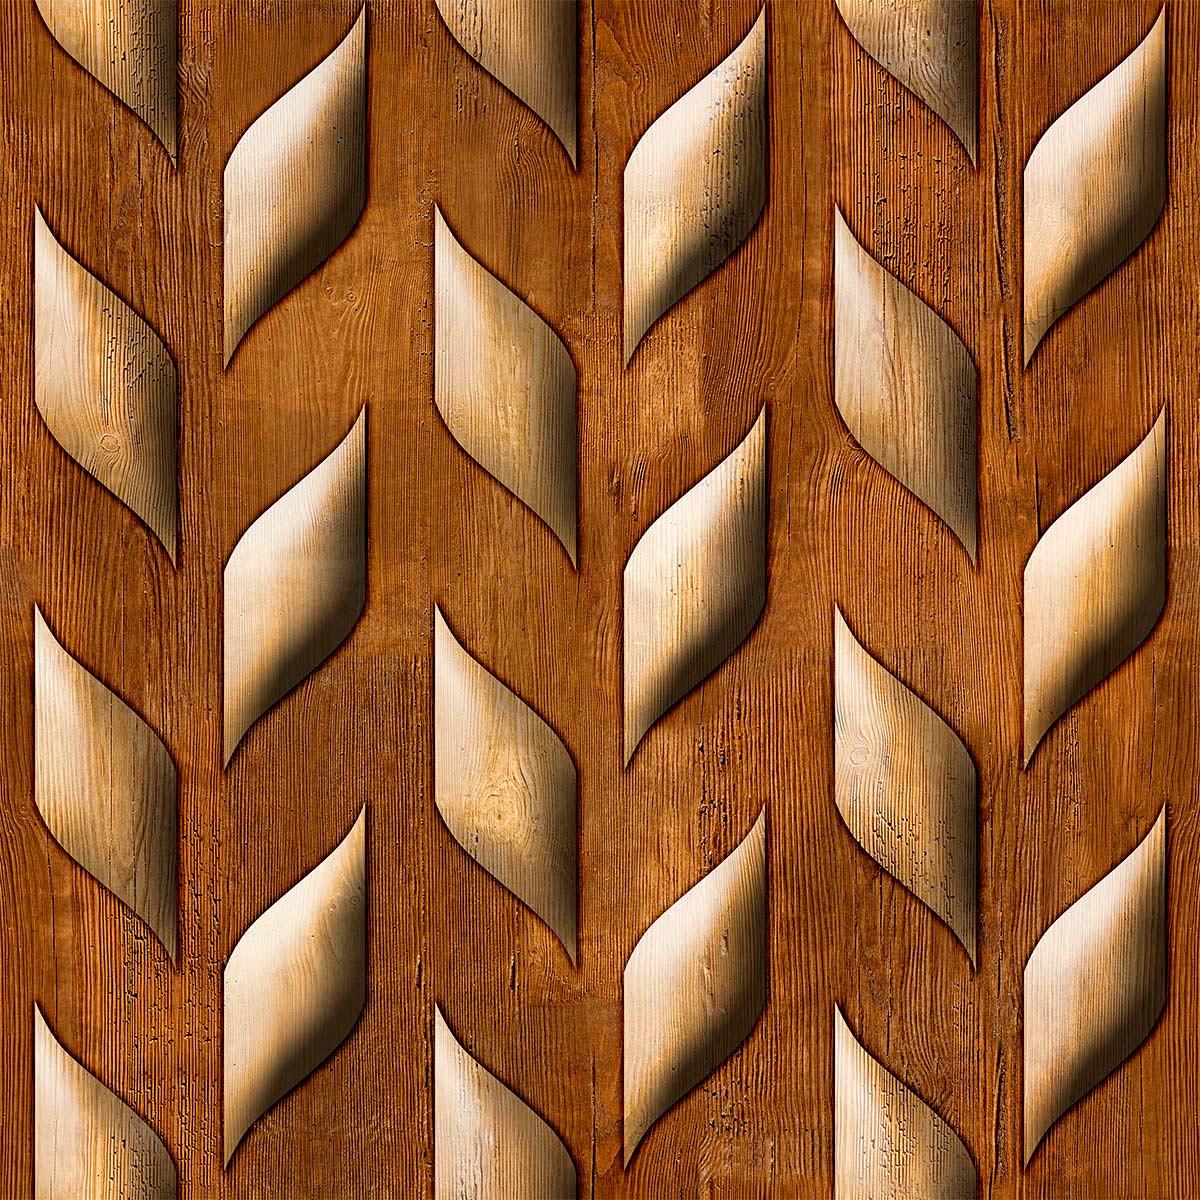 Papel de Parede Madeira Cedro Folhas Aspecto 3D Adesivo P038